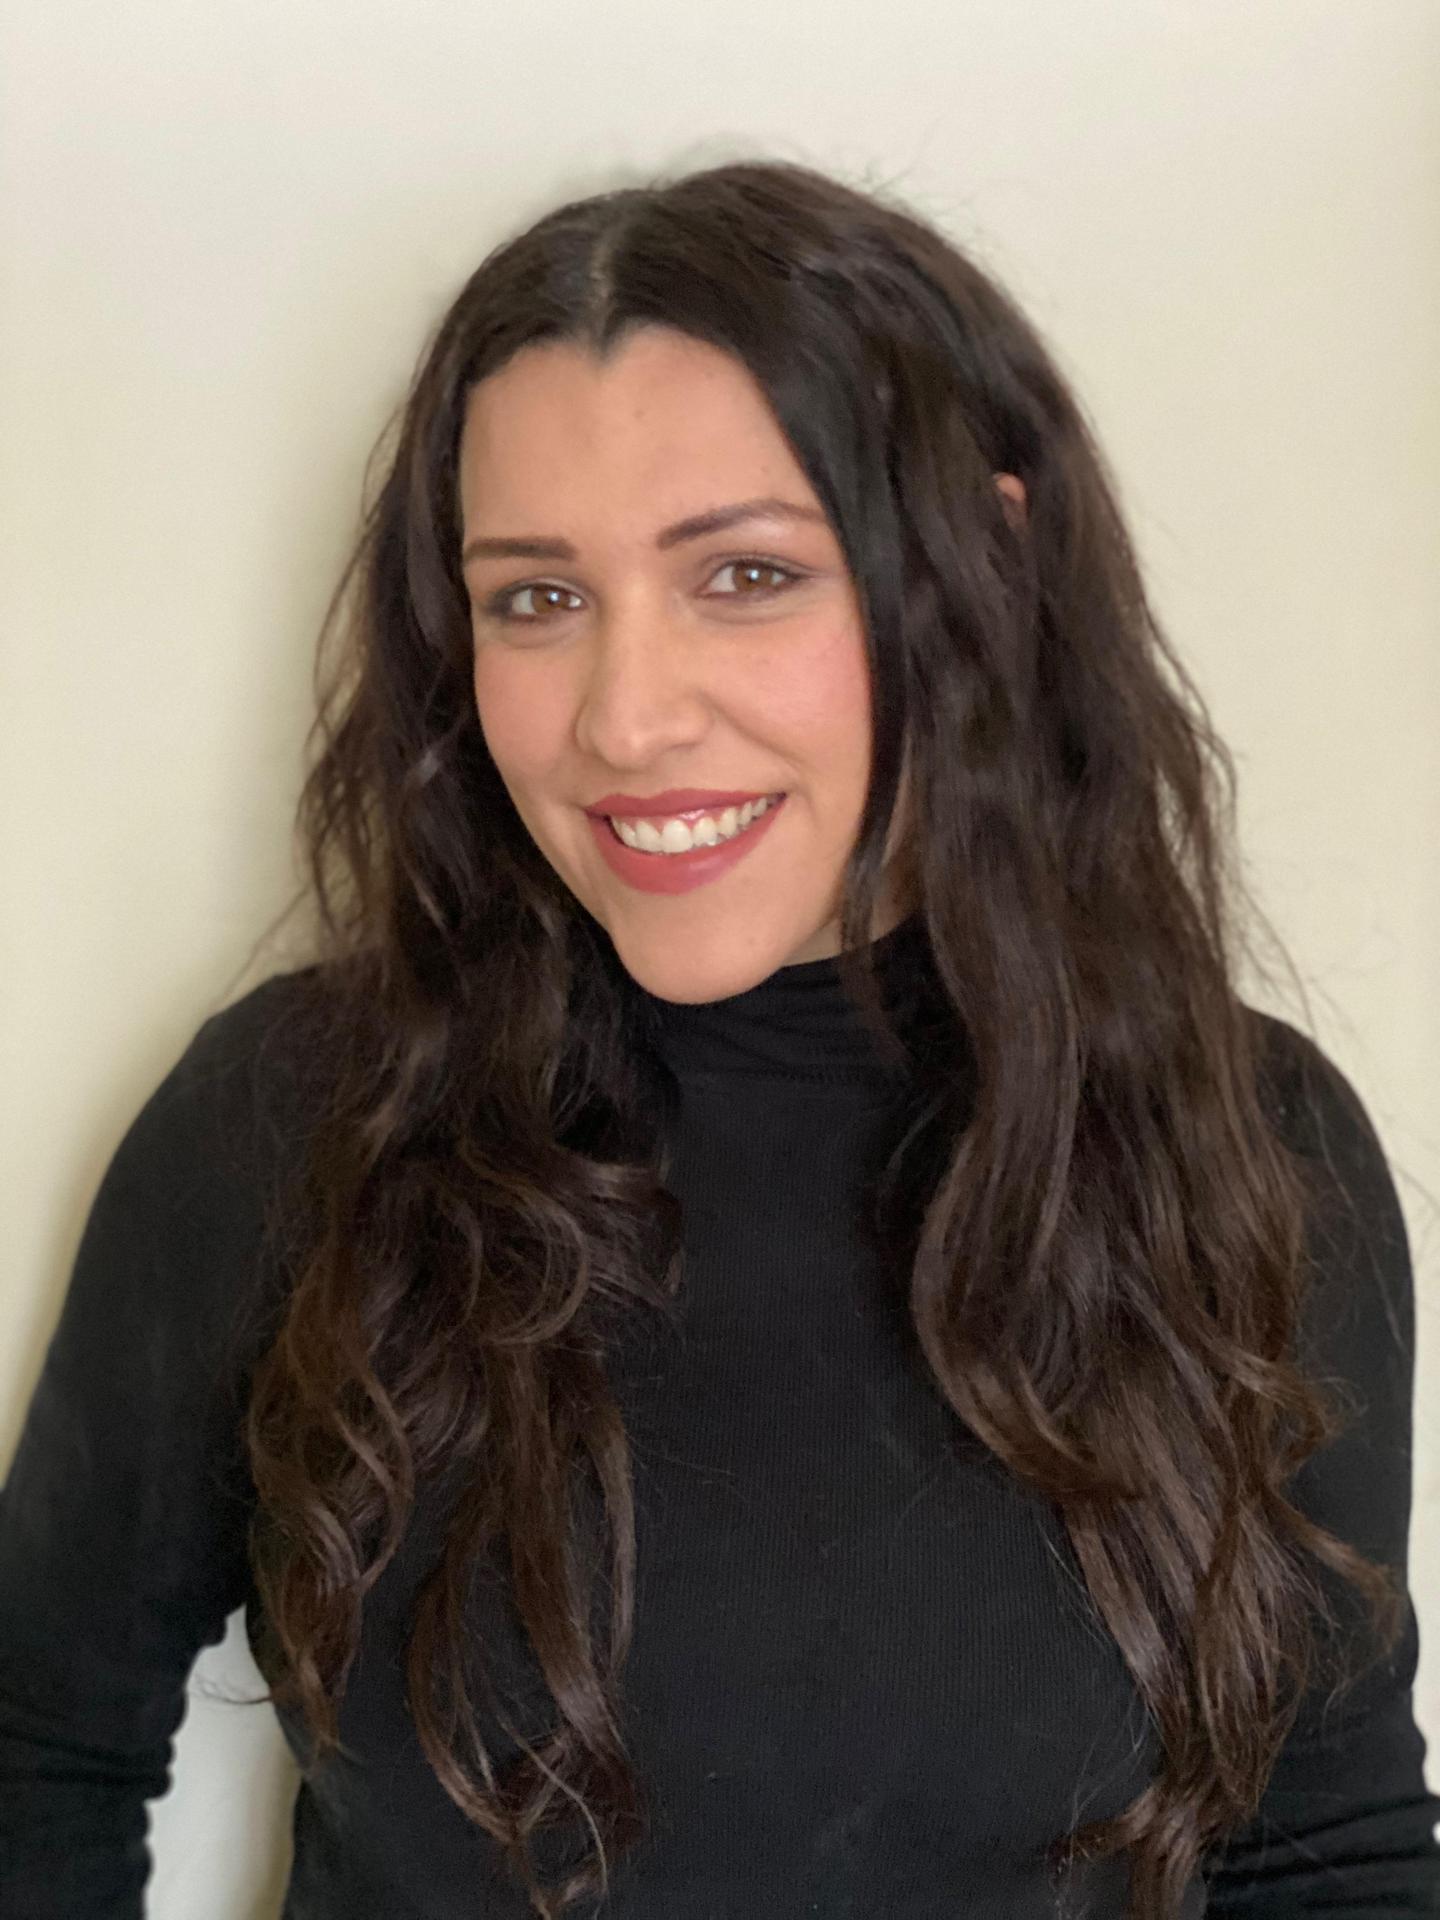 Briana McCarthy